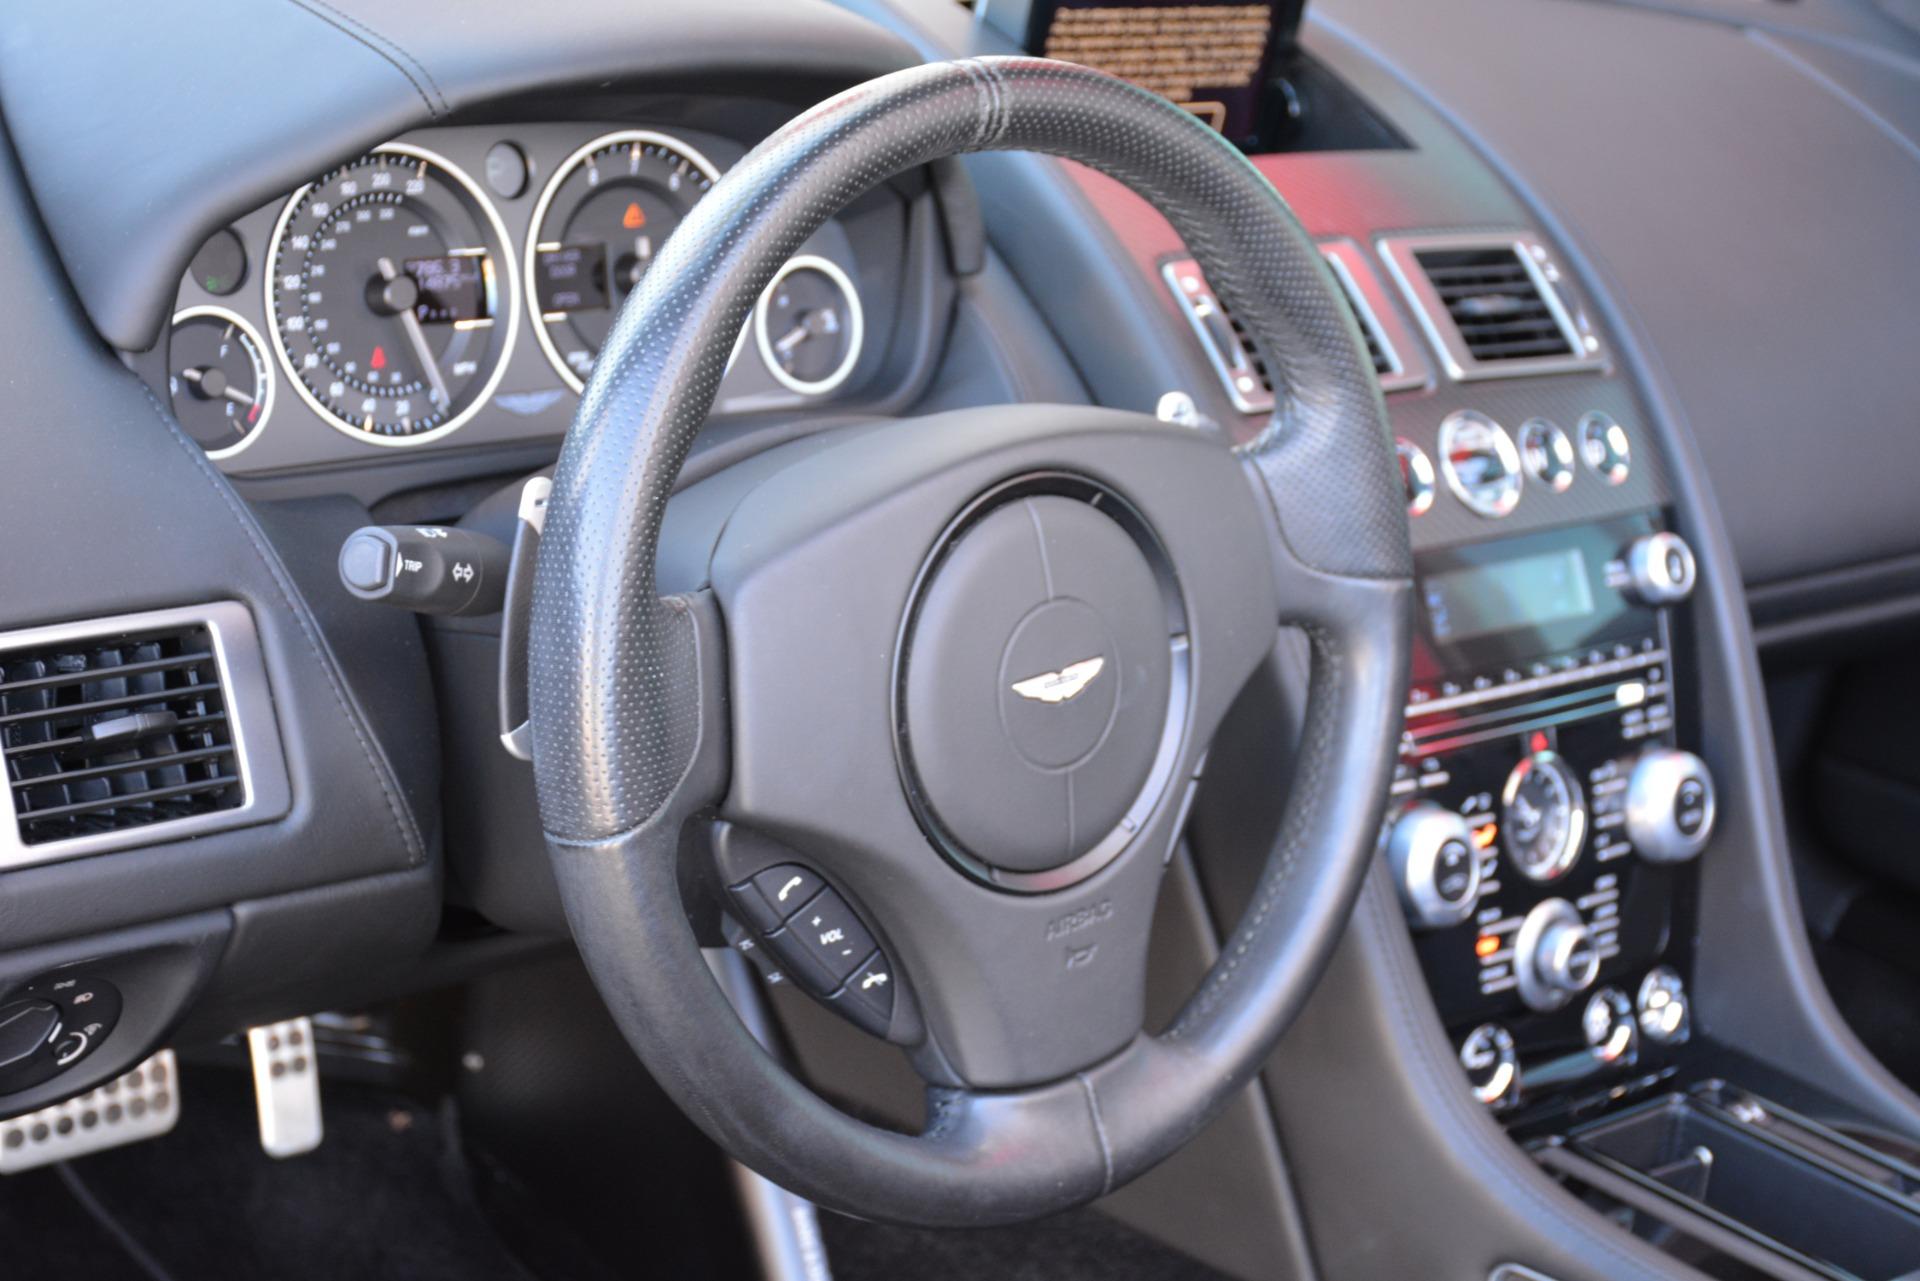 Used-2012-Aston-Martin-DBS-Volante-Carbon-Edition-Volante-Carbon